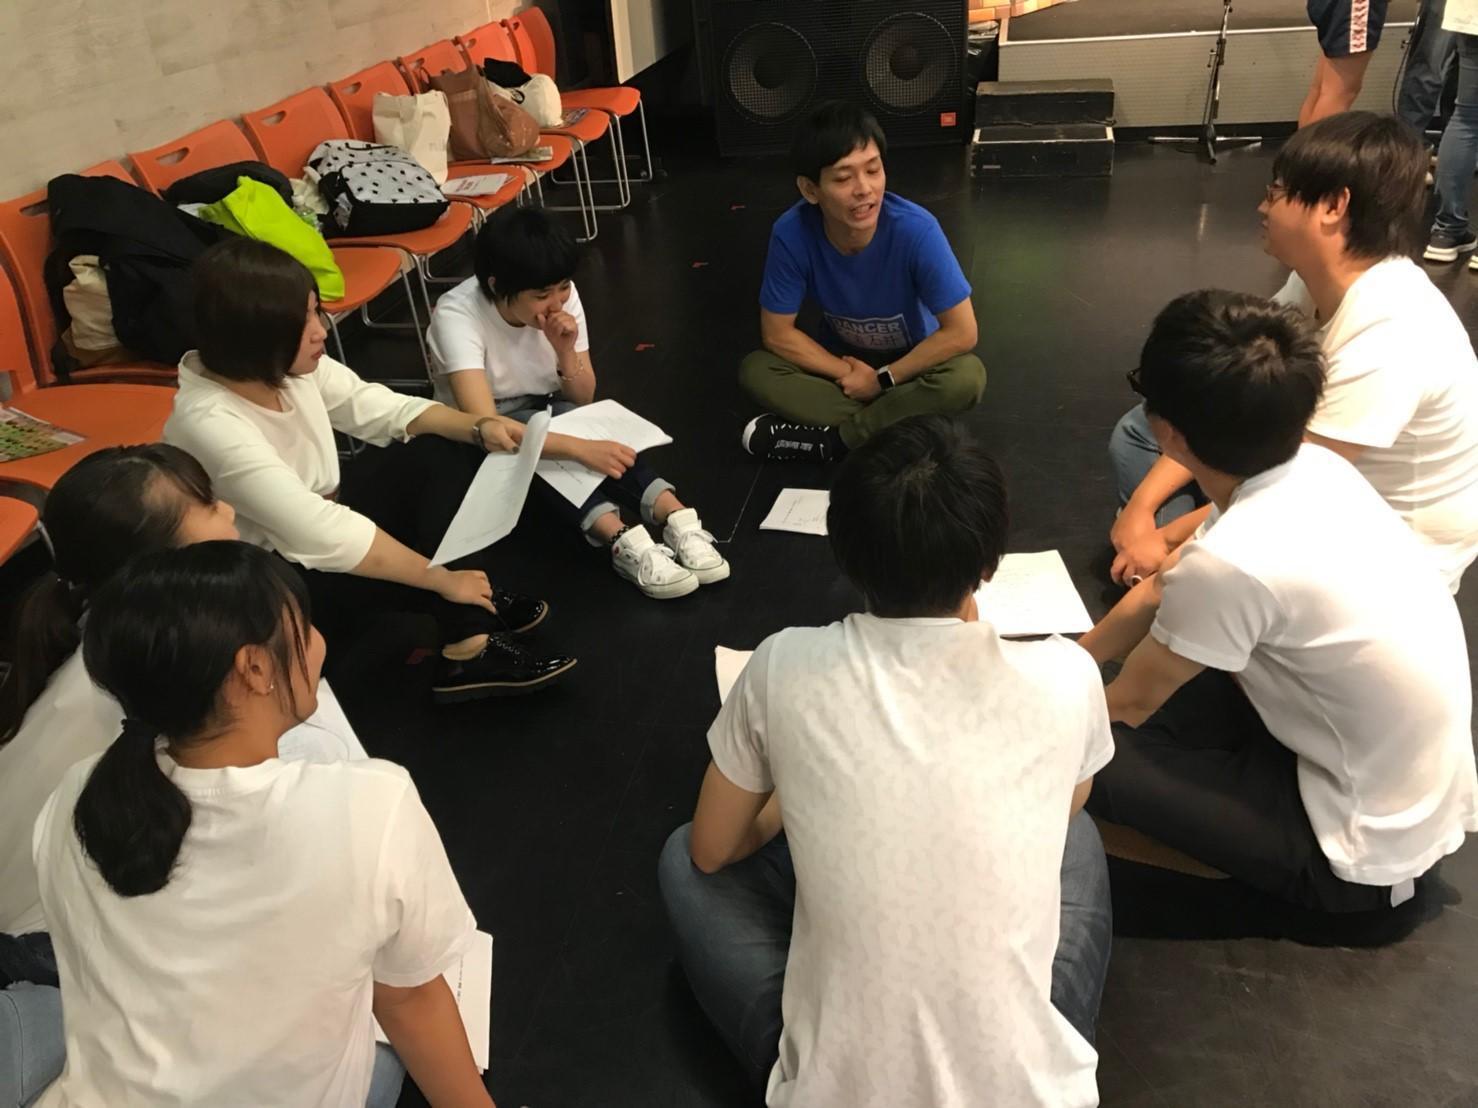 http://news.yoshimoto.co.jp/20181006174737-35cbe603659d59833b87088a1040d77a19f6dafb.jpg